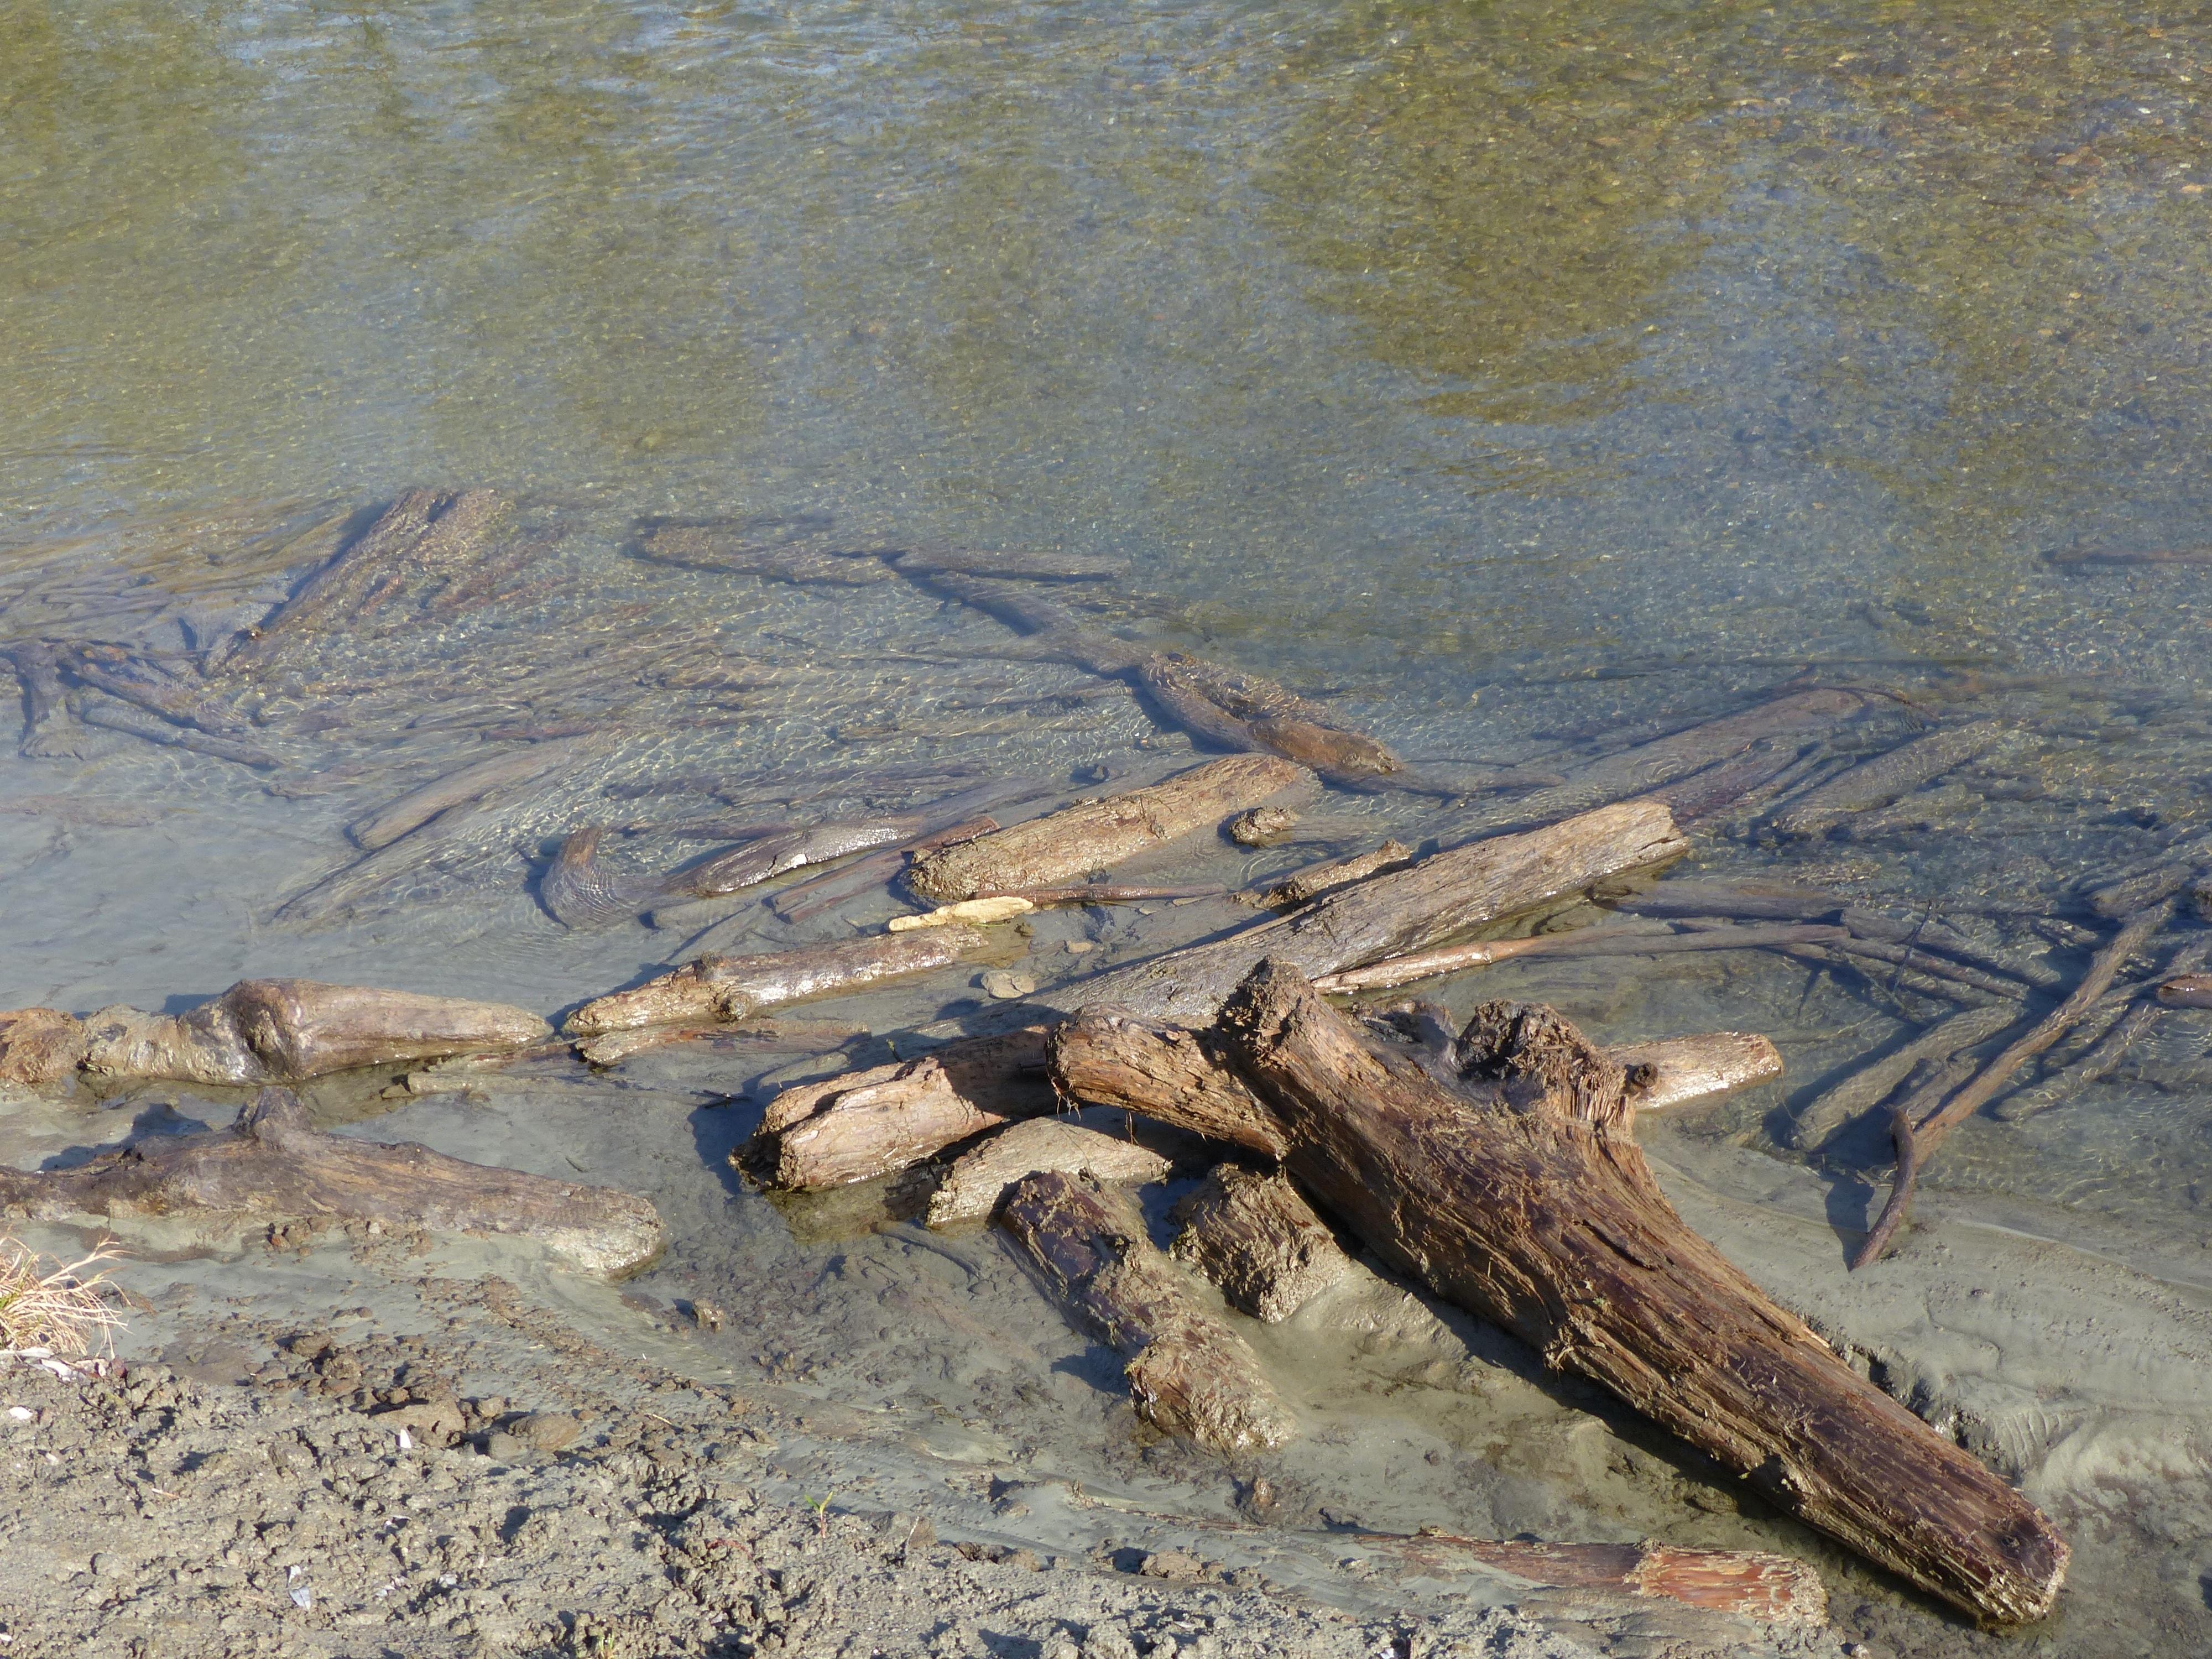 могут находки на берегу реки фото прошедшие годы